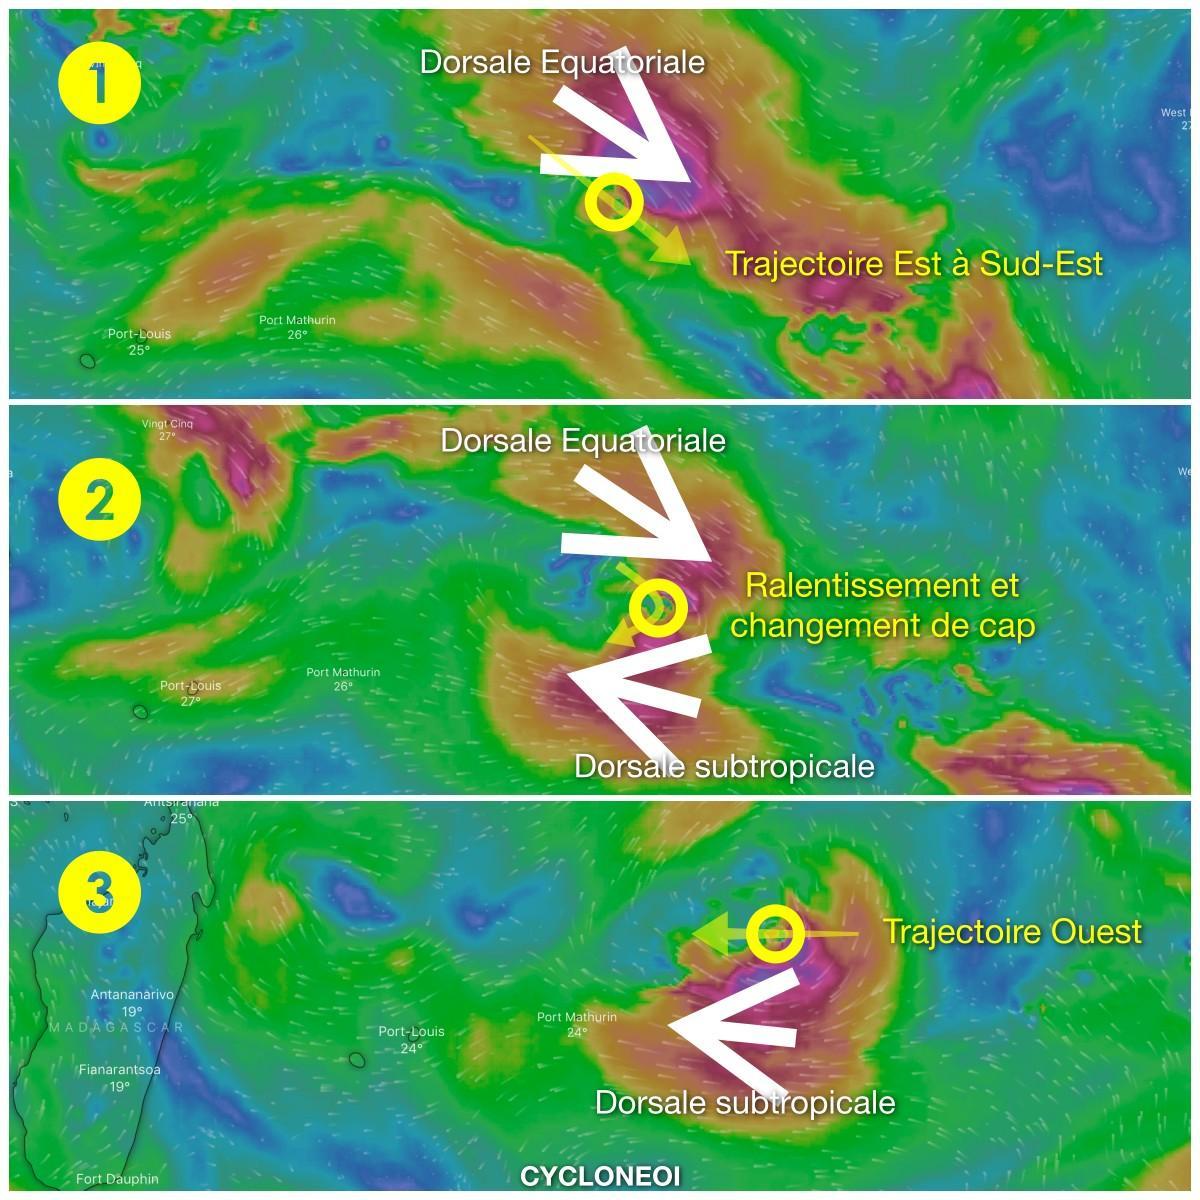 Trajectoire danilo explication cycloneoi